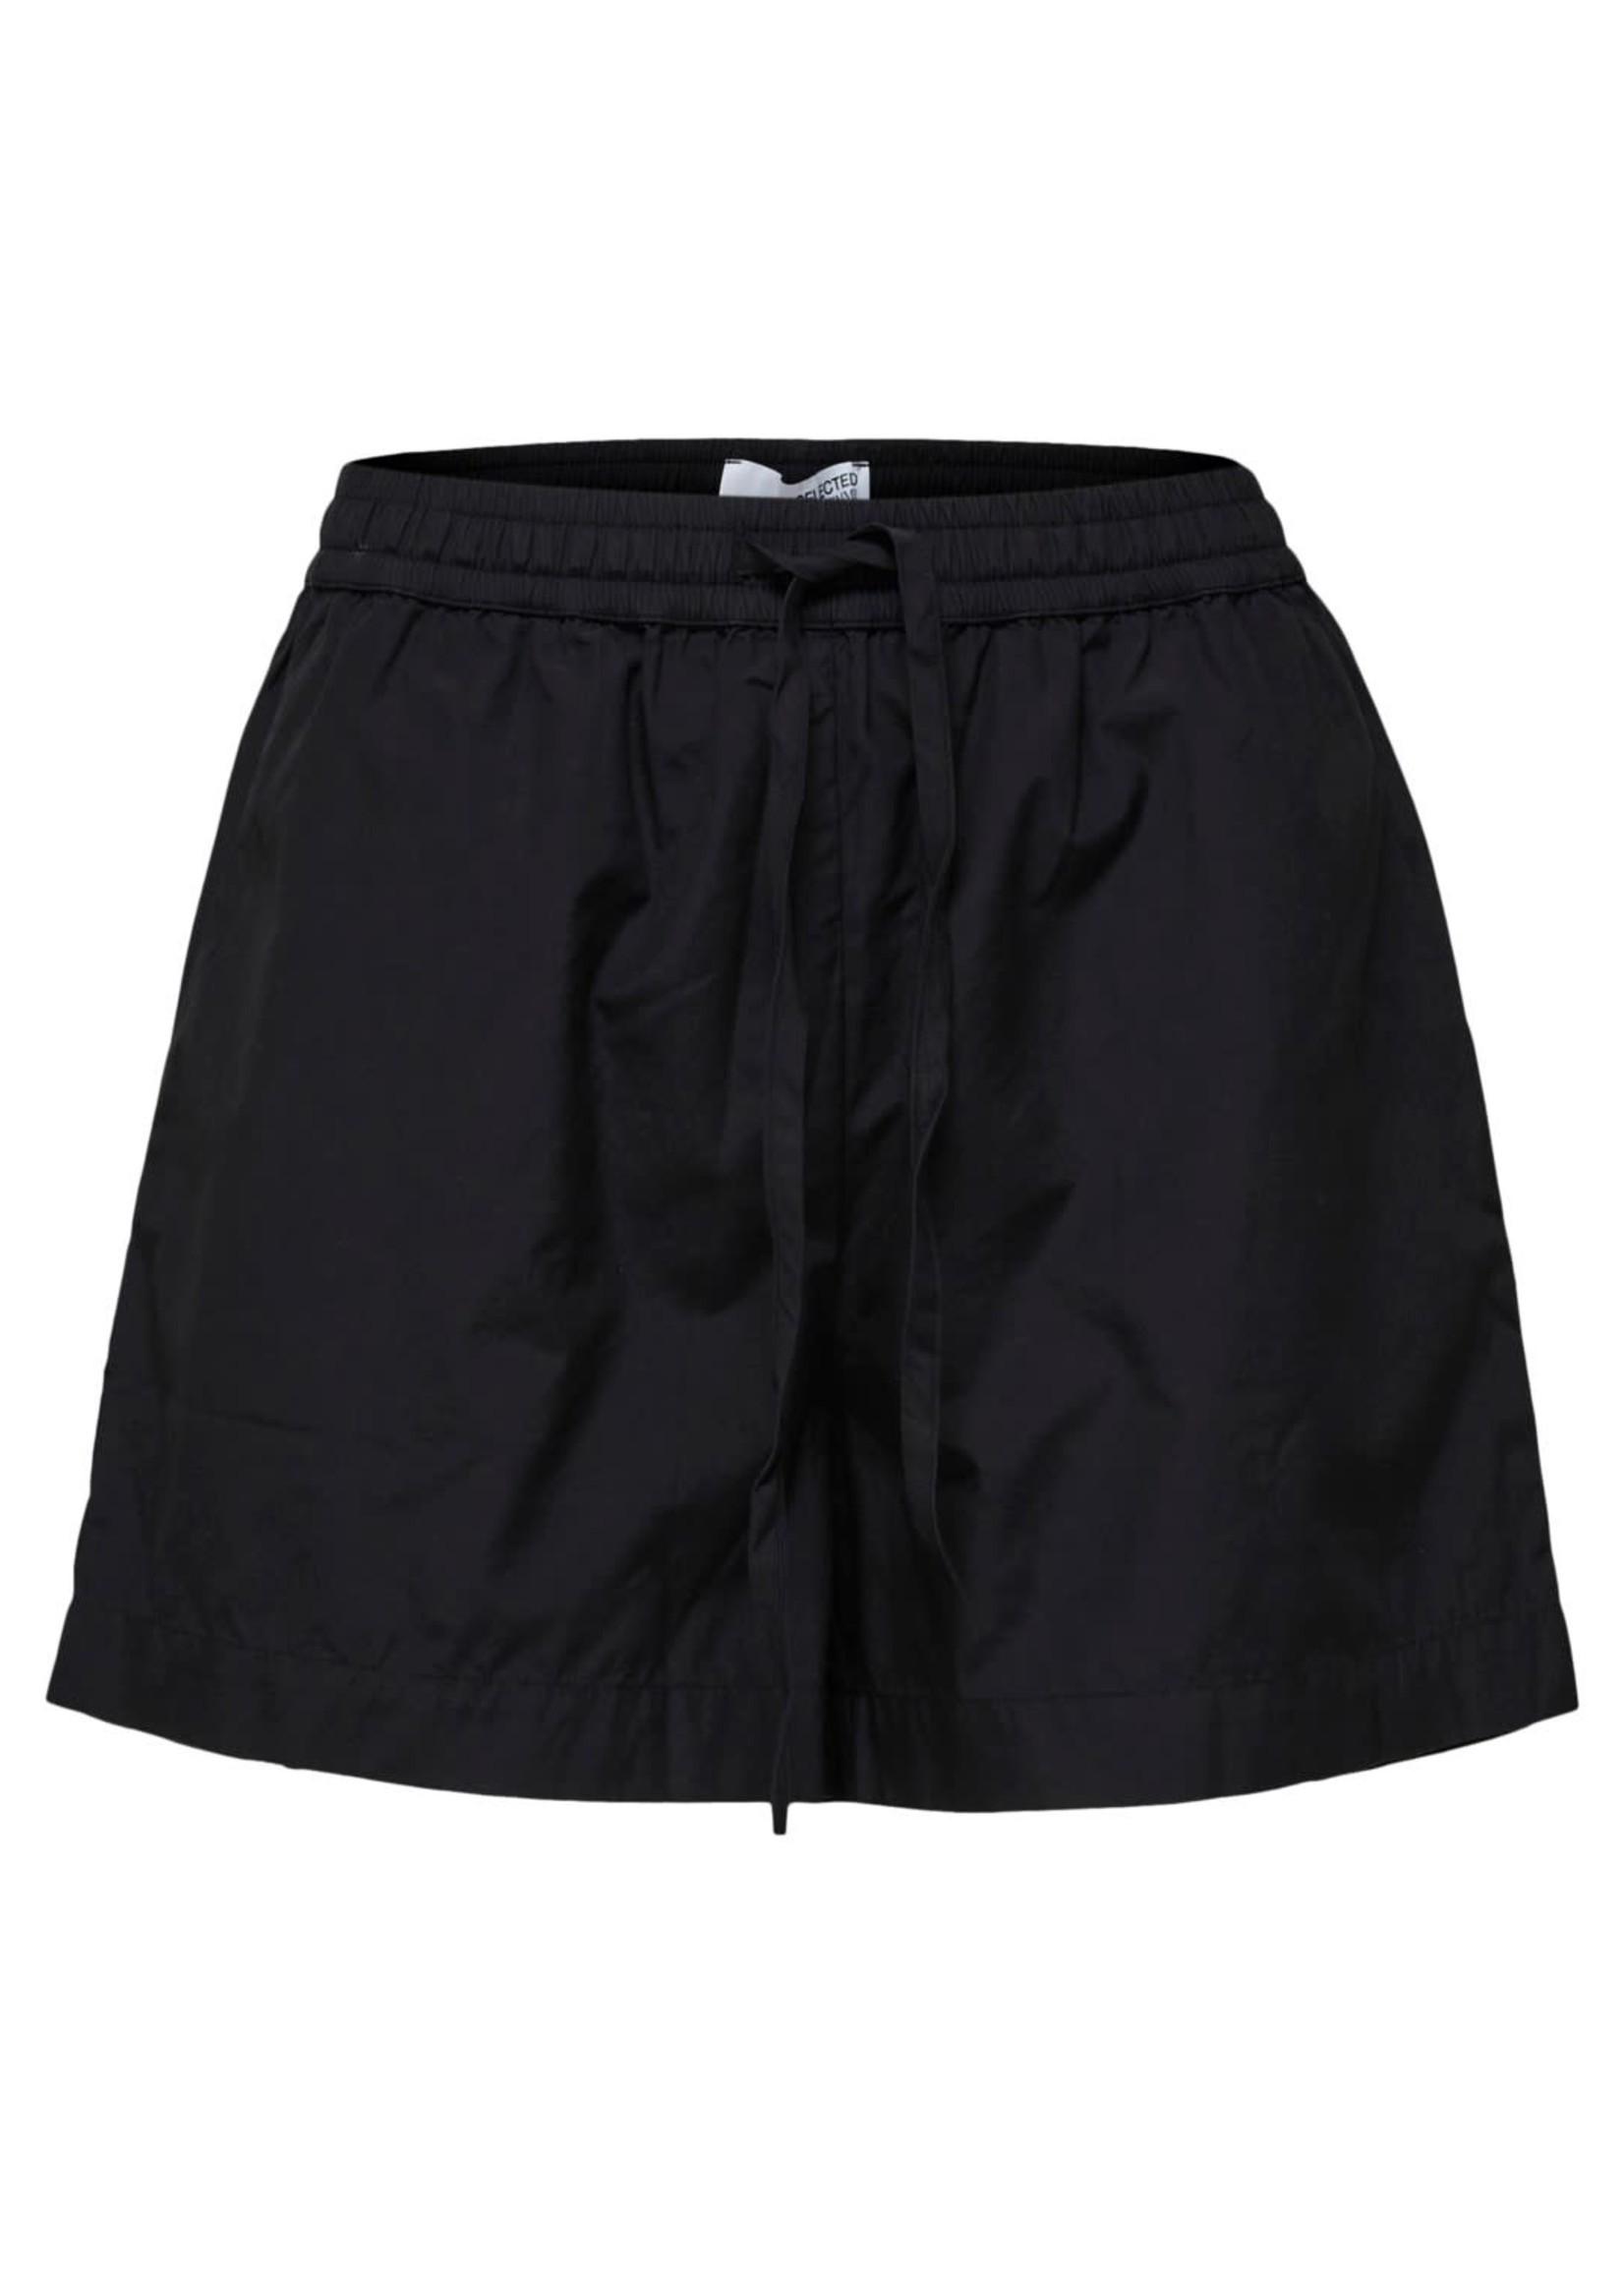 Selected Femme Lilo mw shorts black